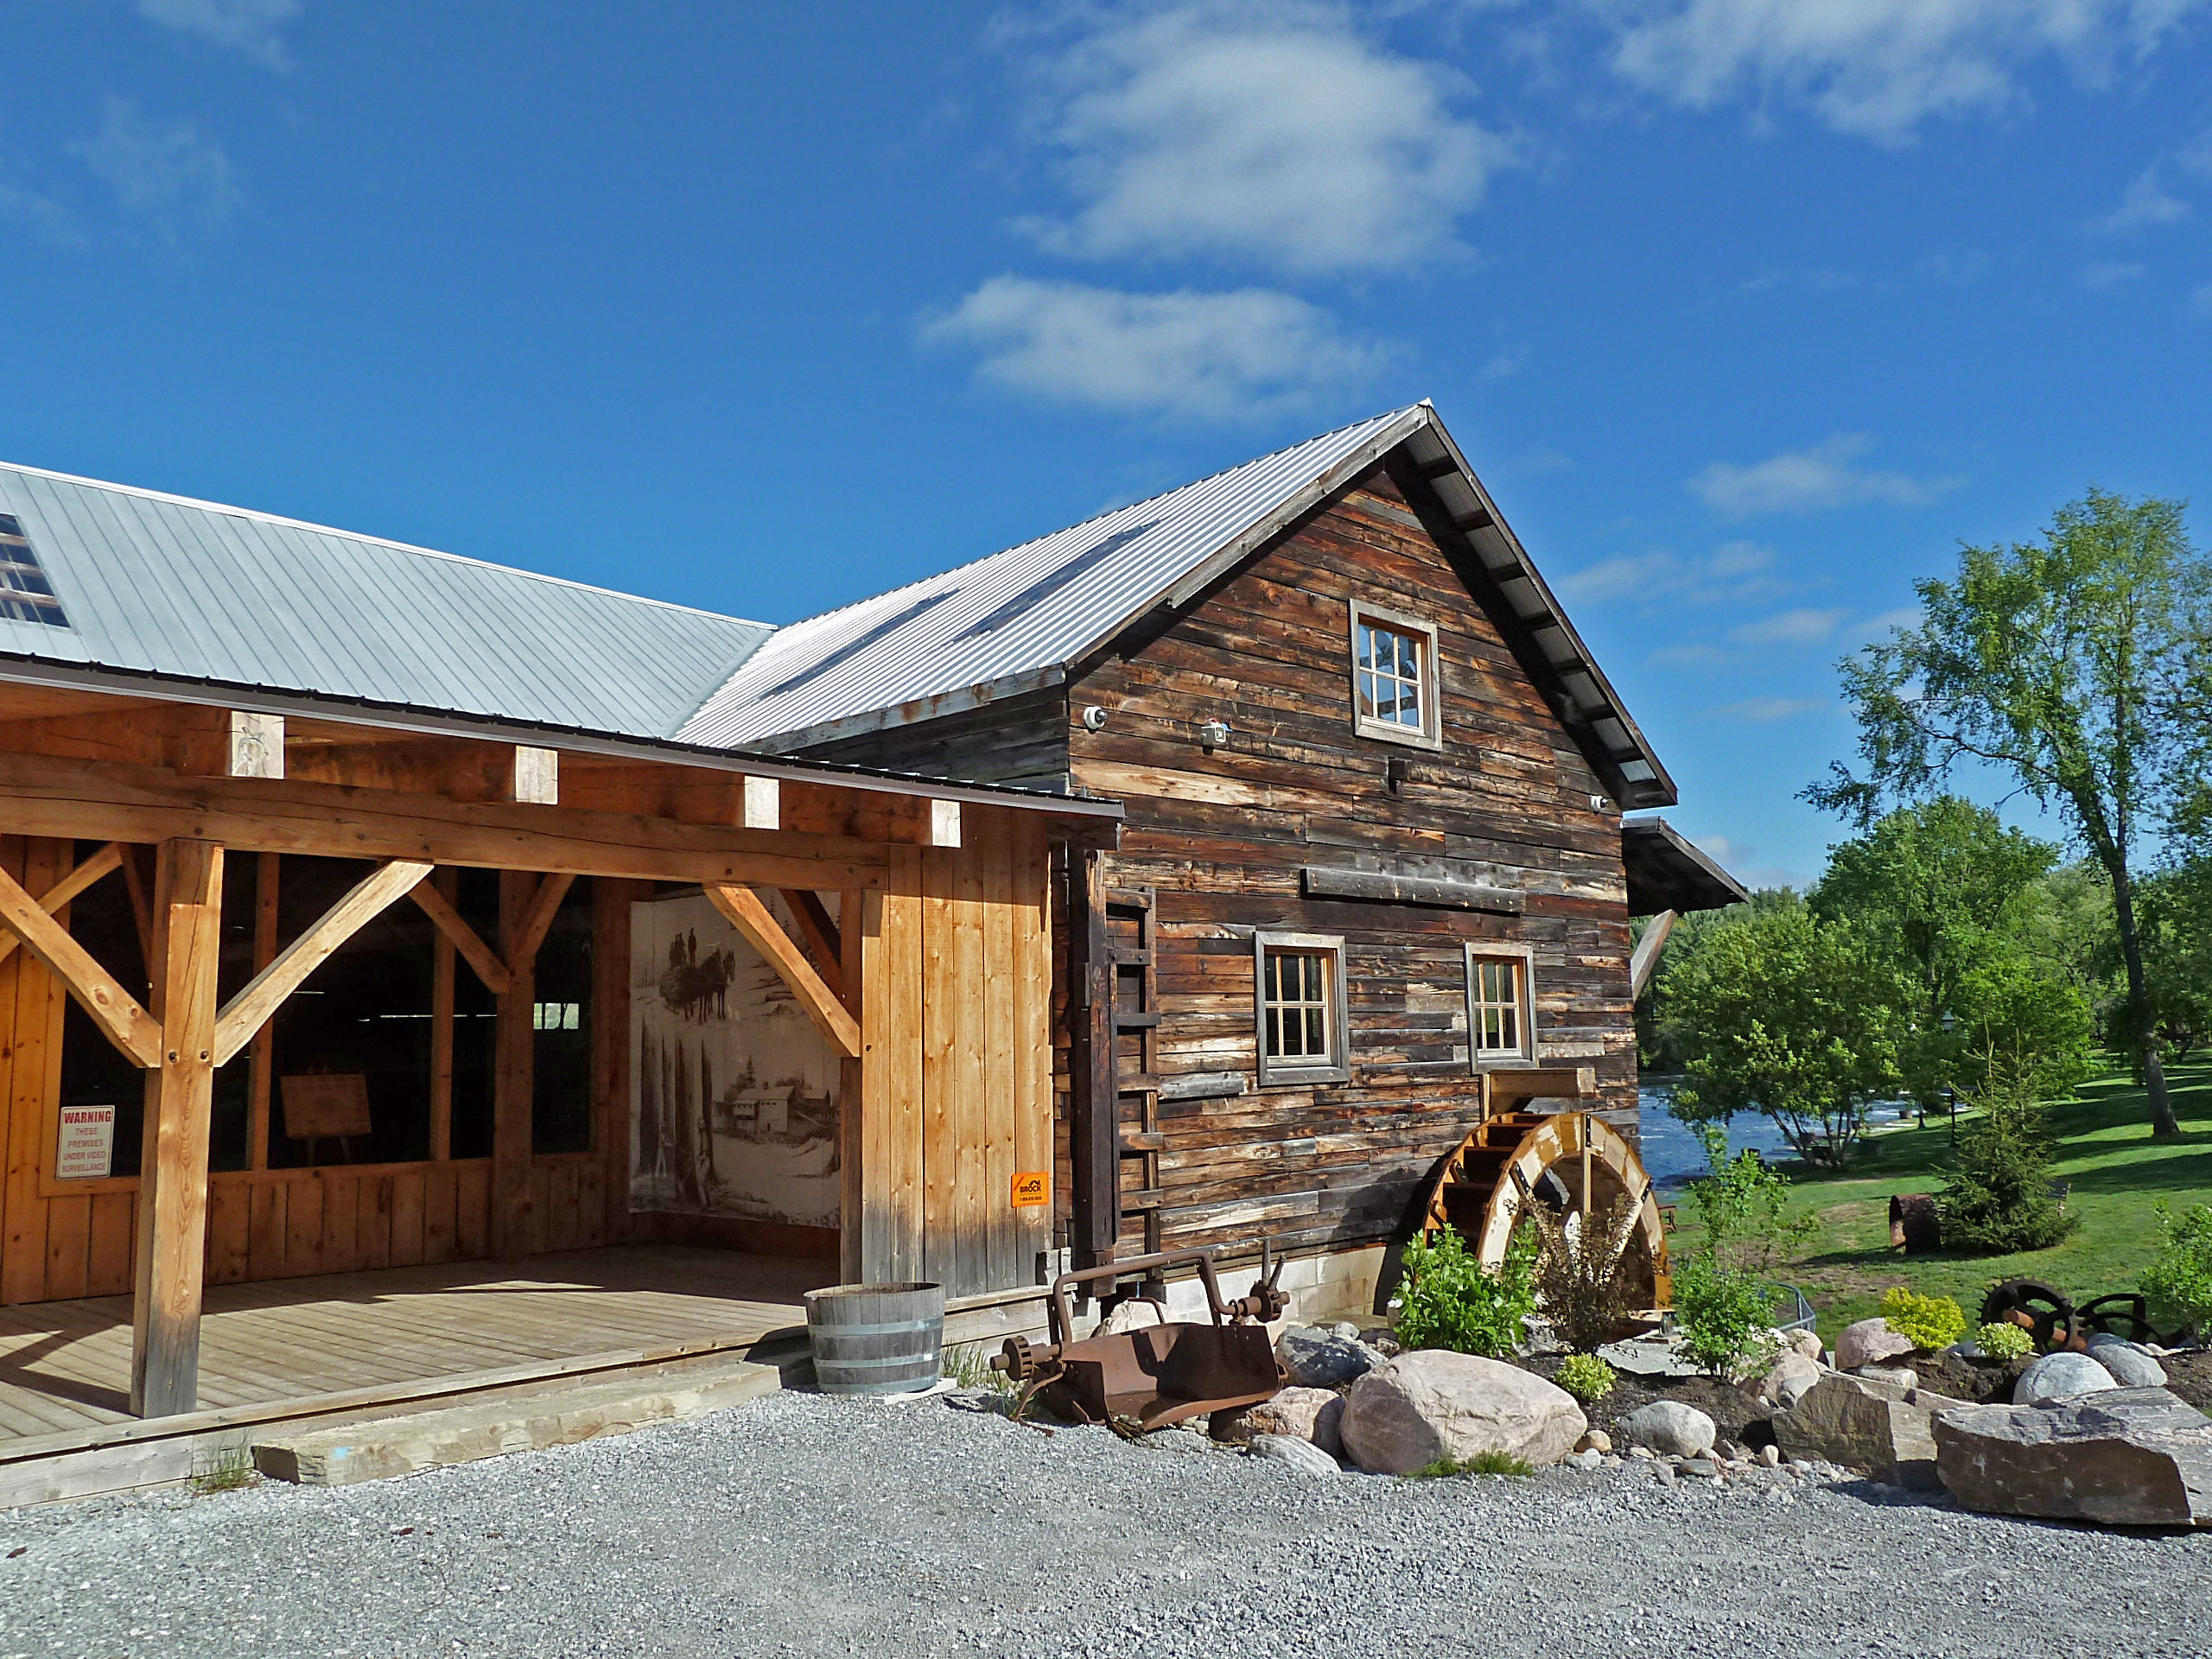 Farm to Shield driving tour